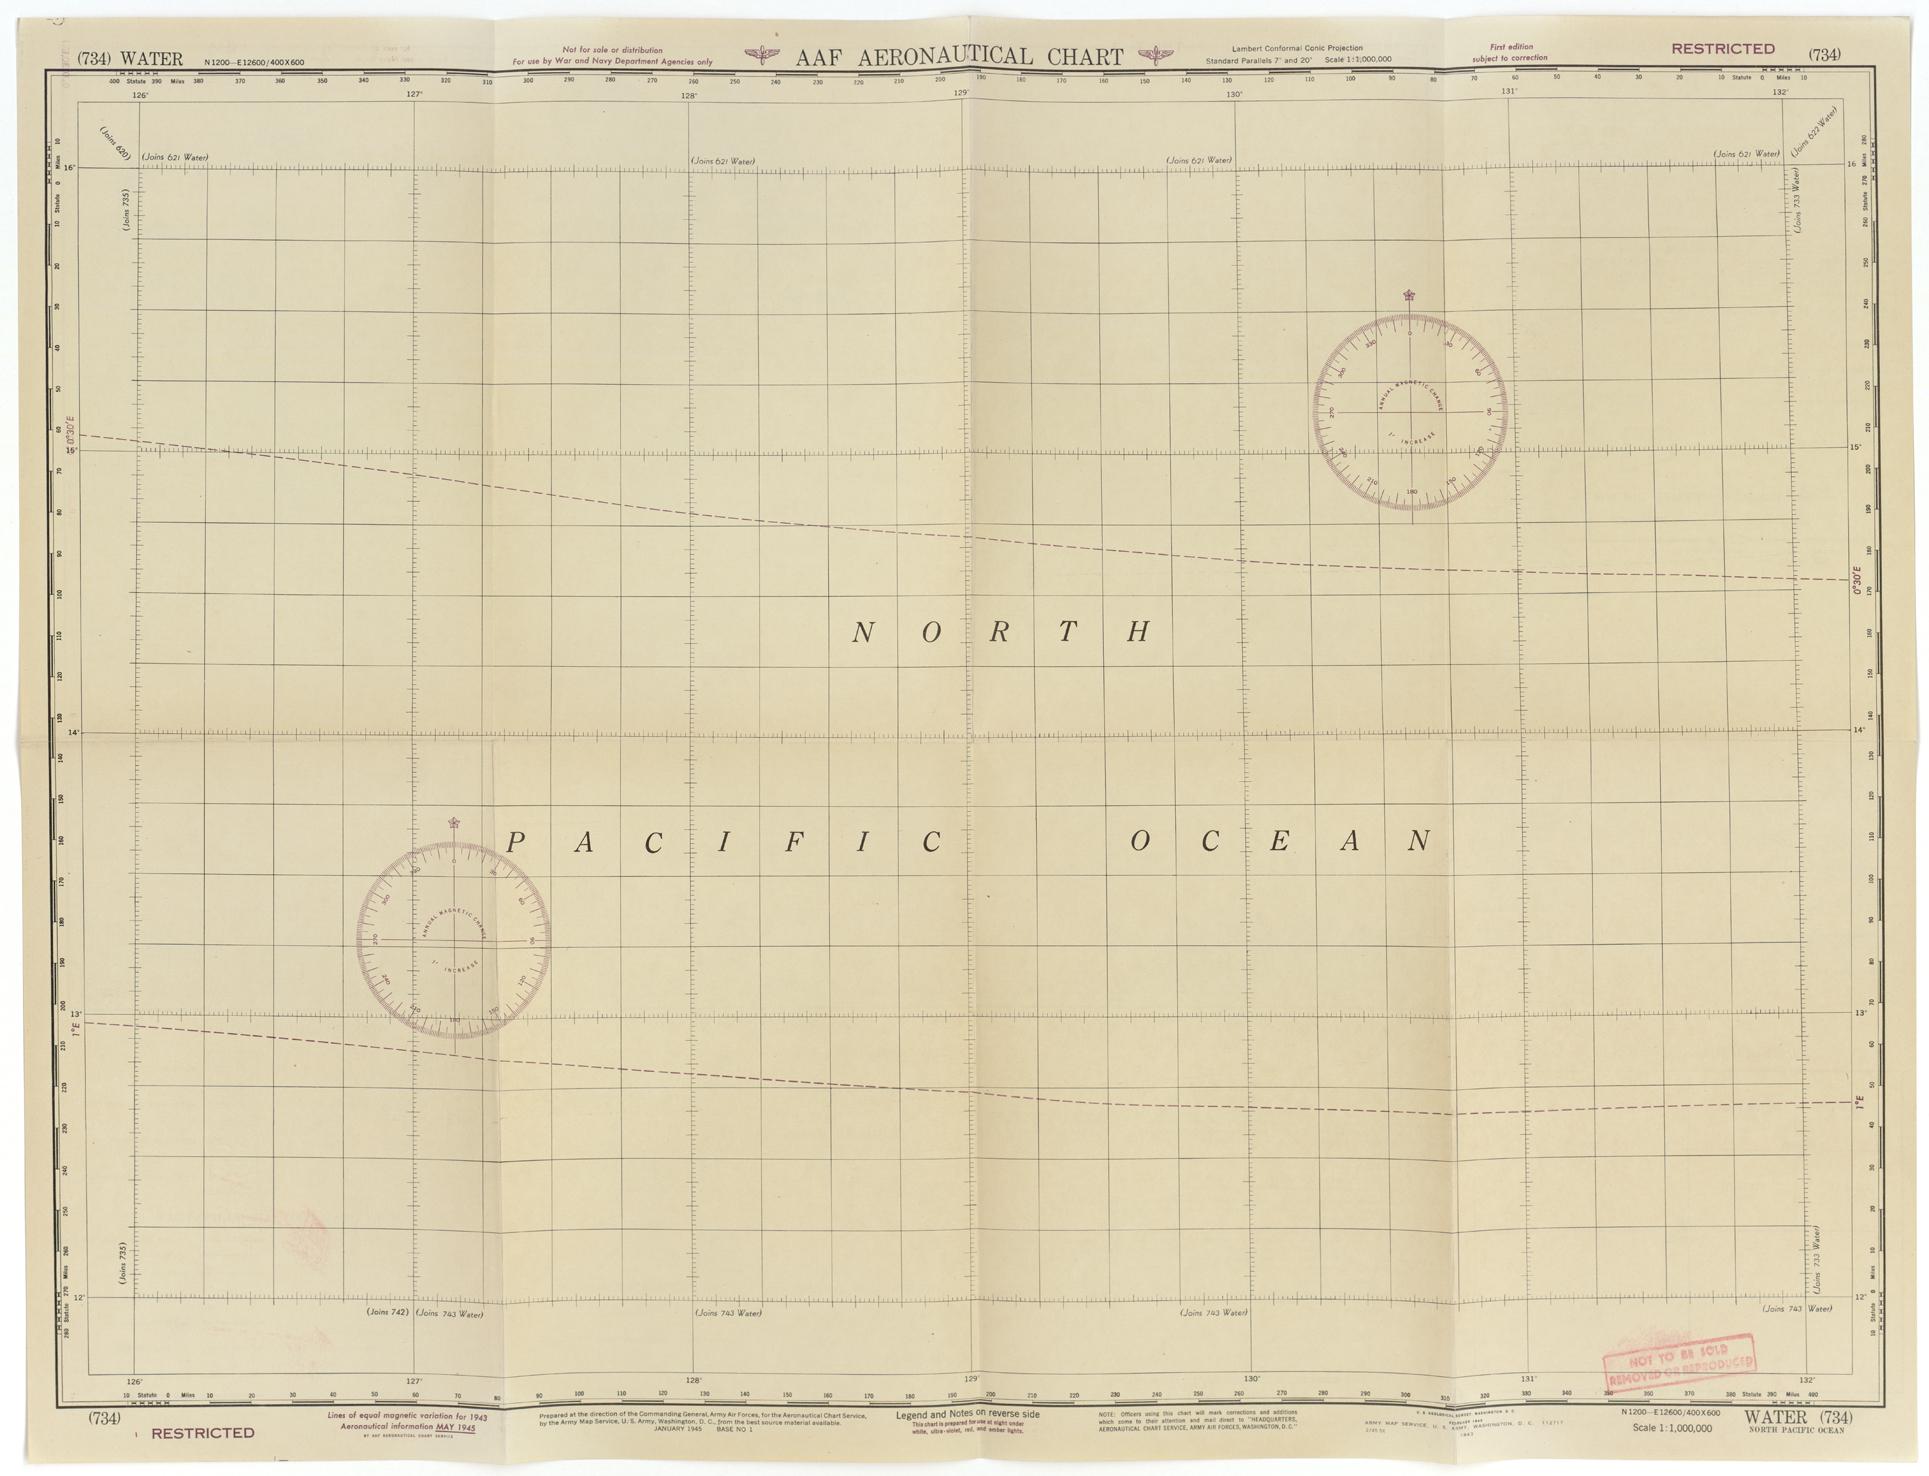 AAF Aero chart sheet 734